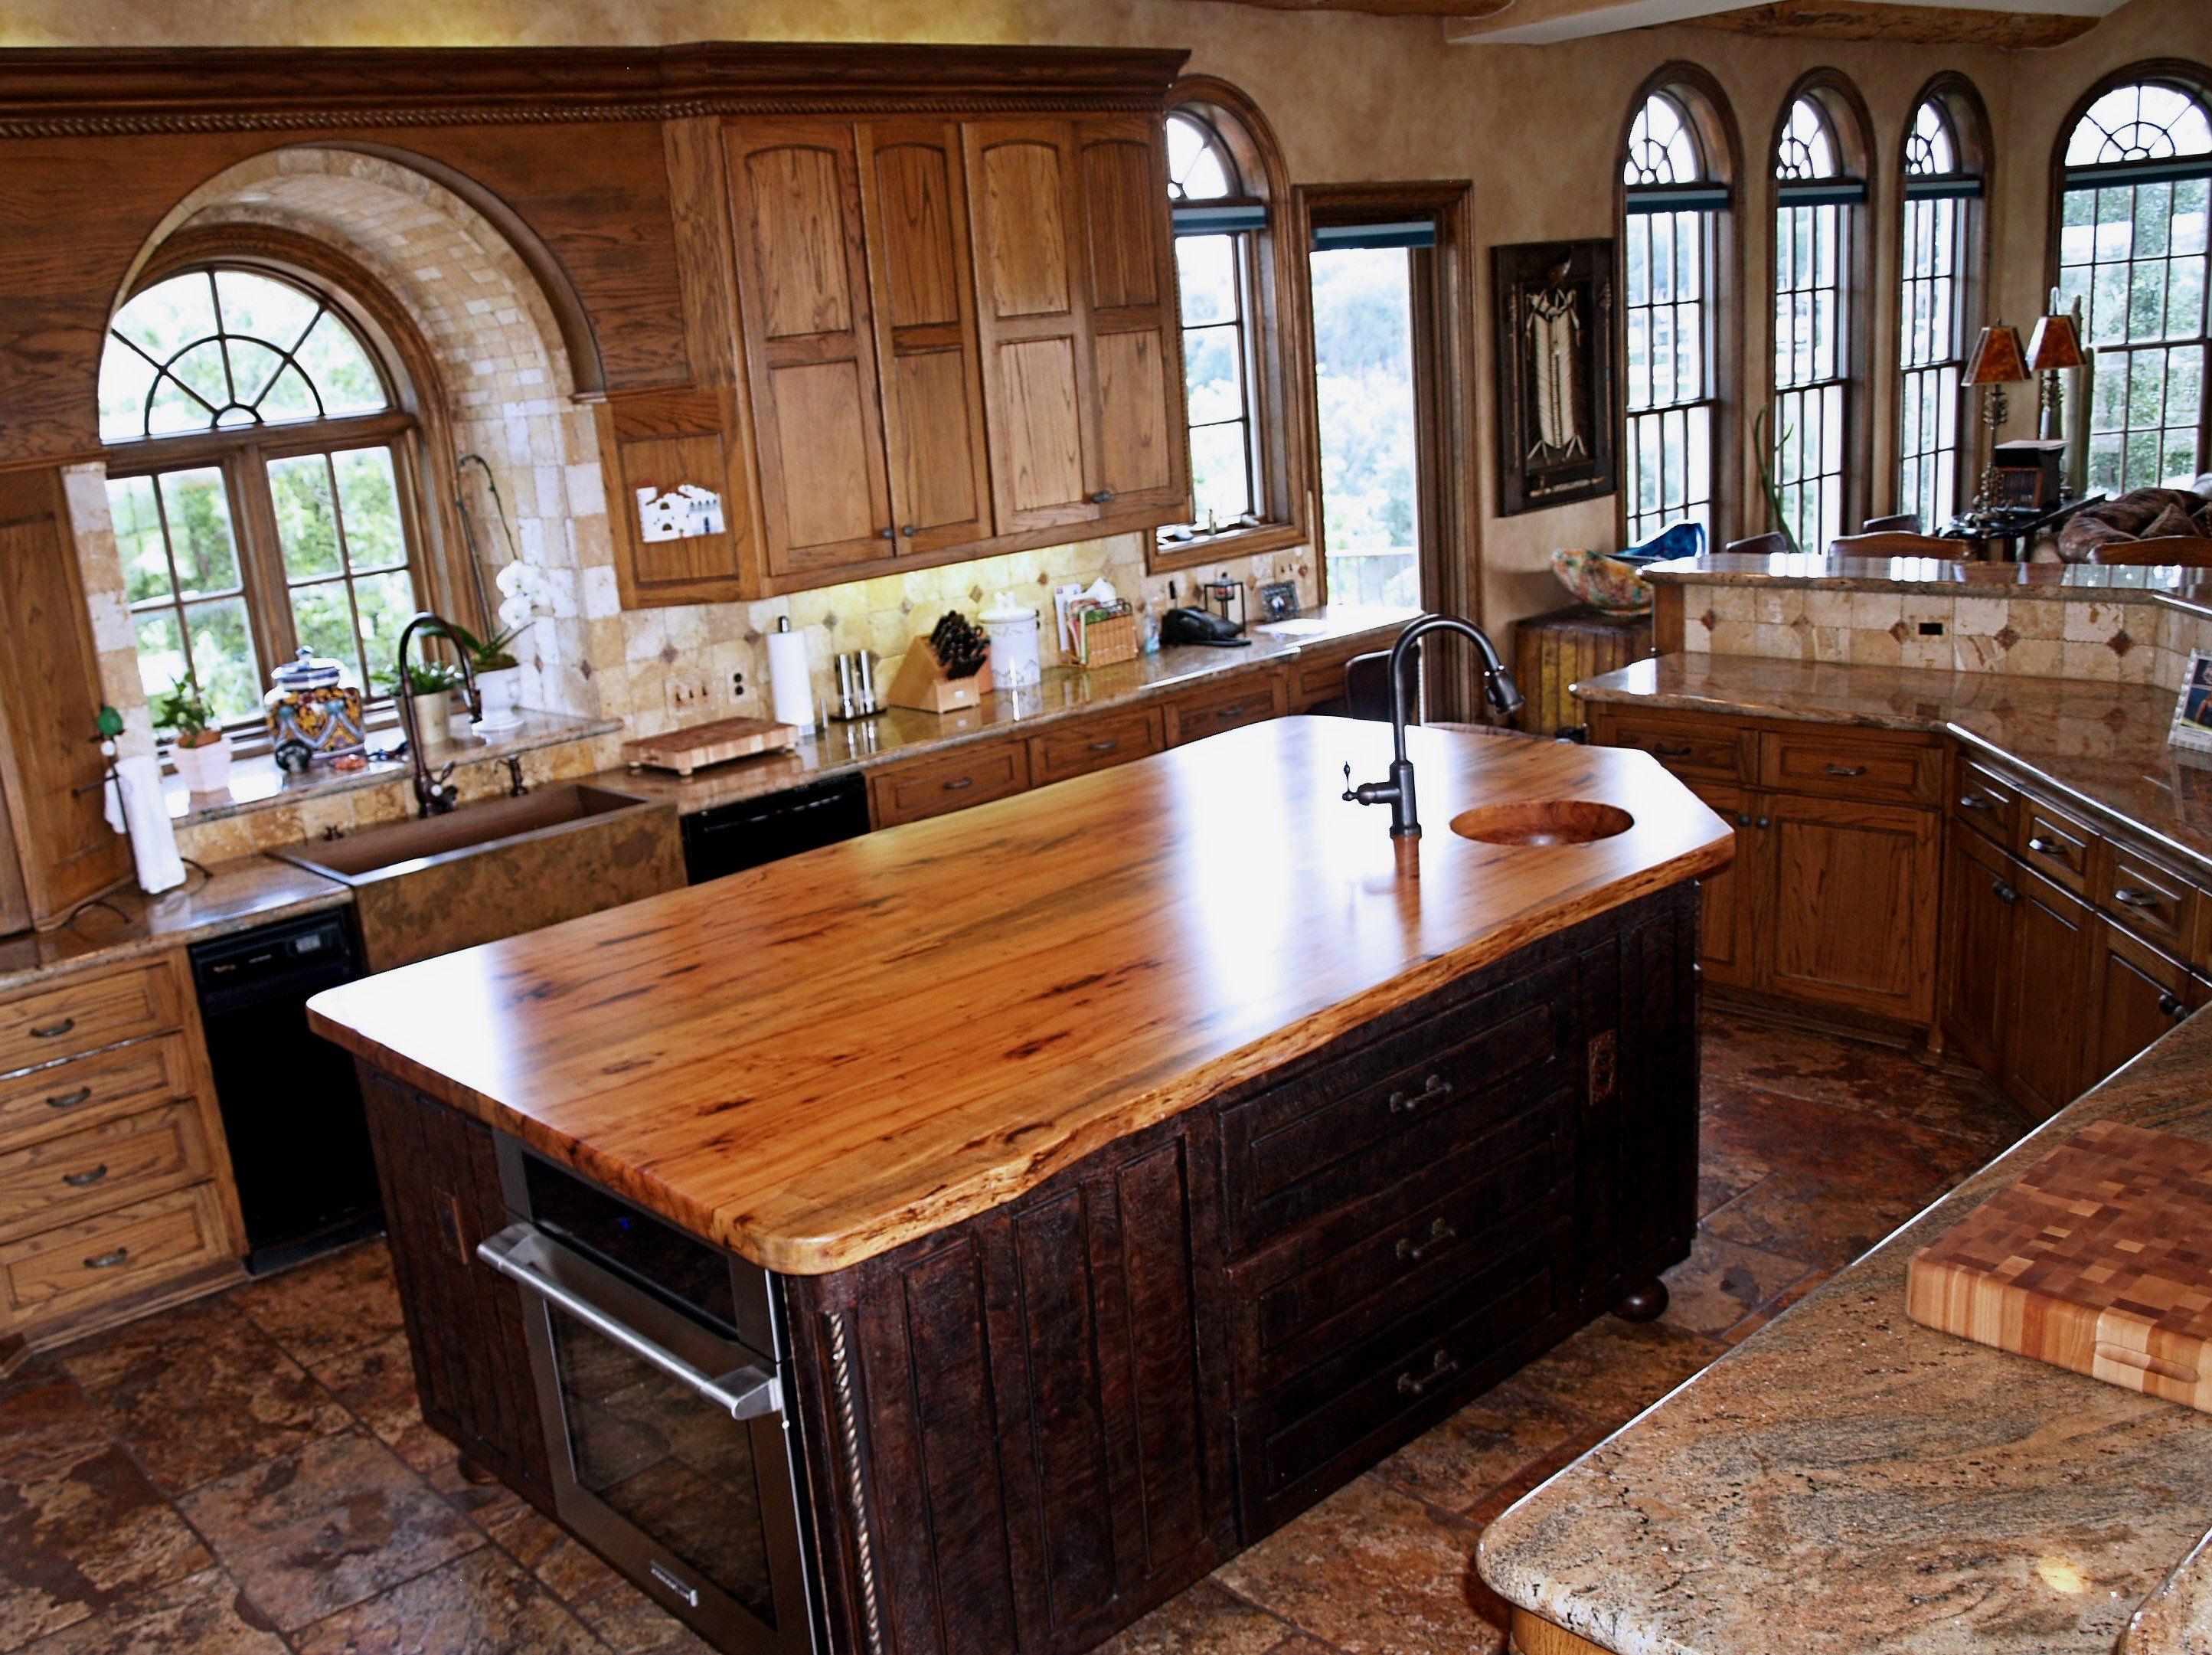 Wood Slab Kitchen Countertops Spalted Pecan Wood Countertop Photo Gallerydevos Custom